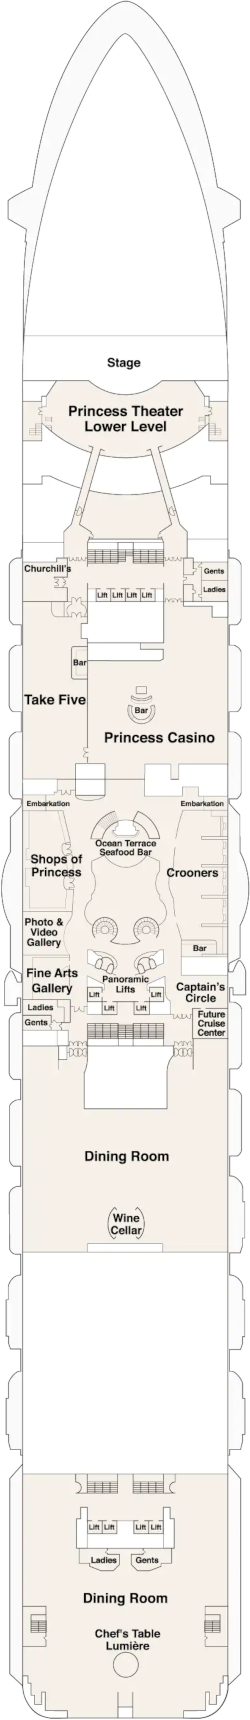 Discovery Princess Fiesta Deck Deck Plan